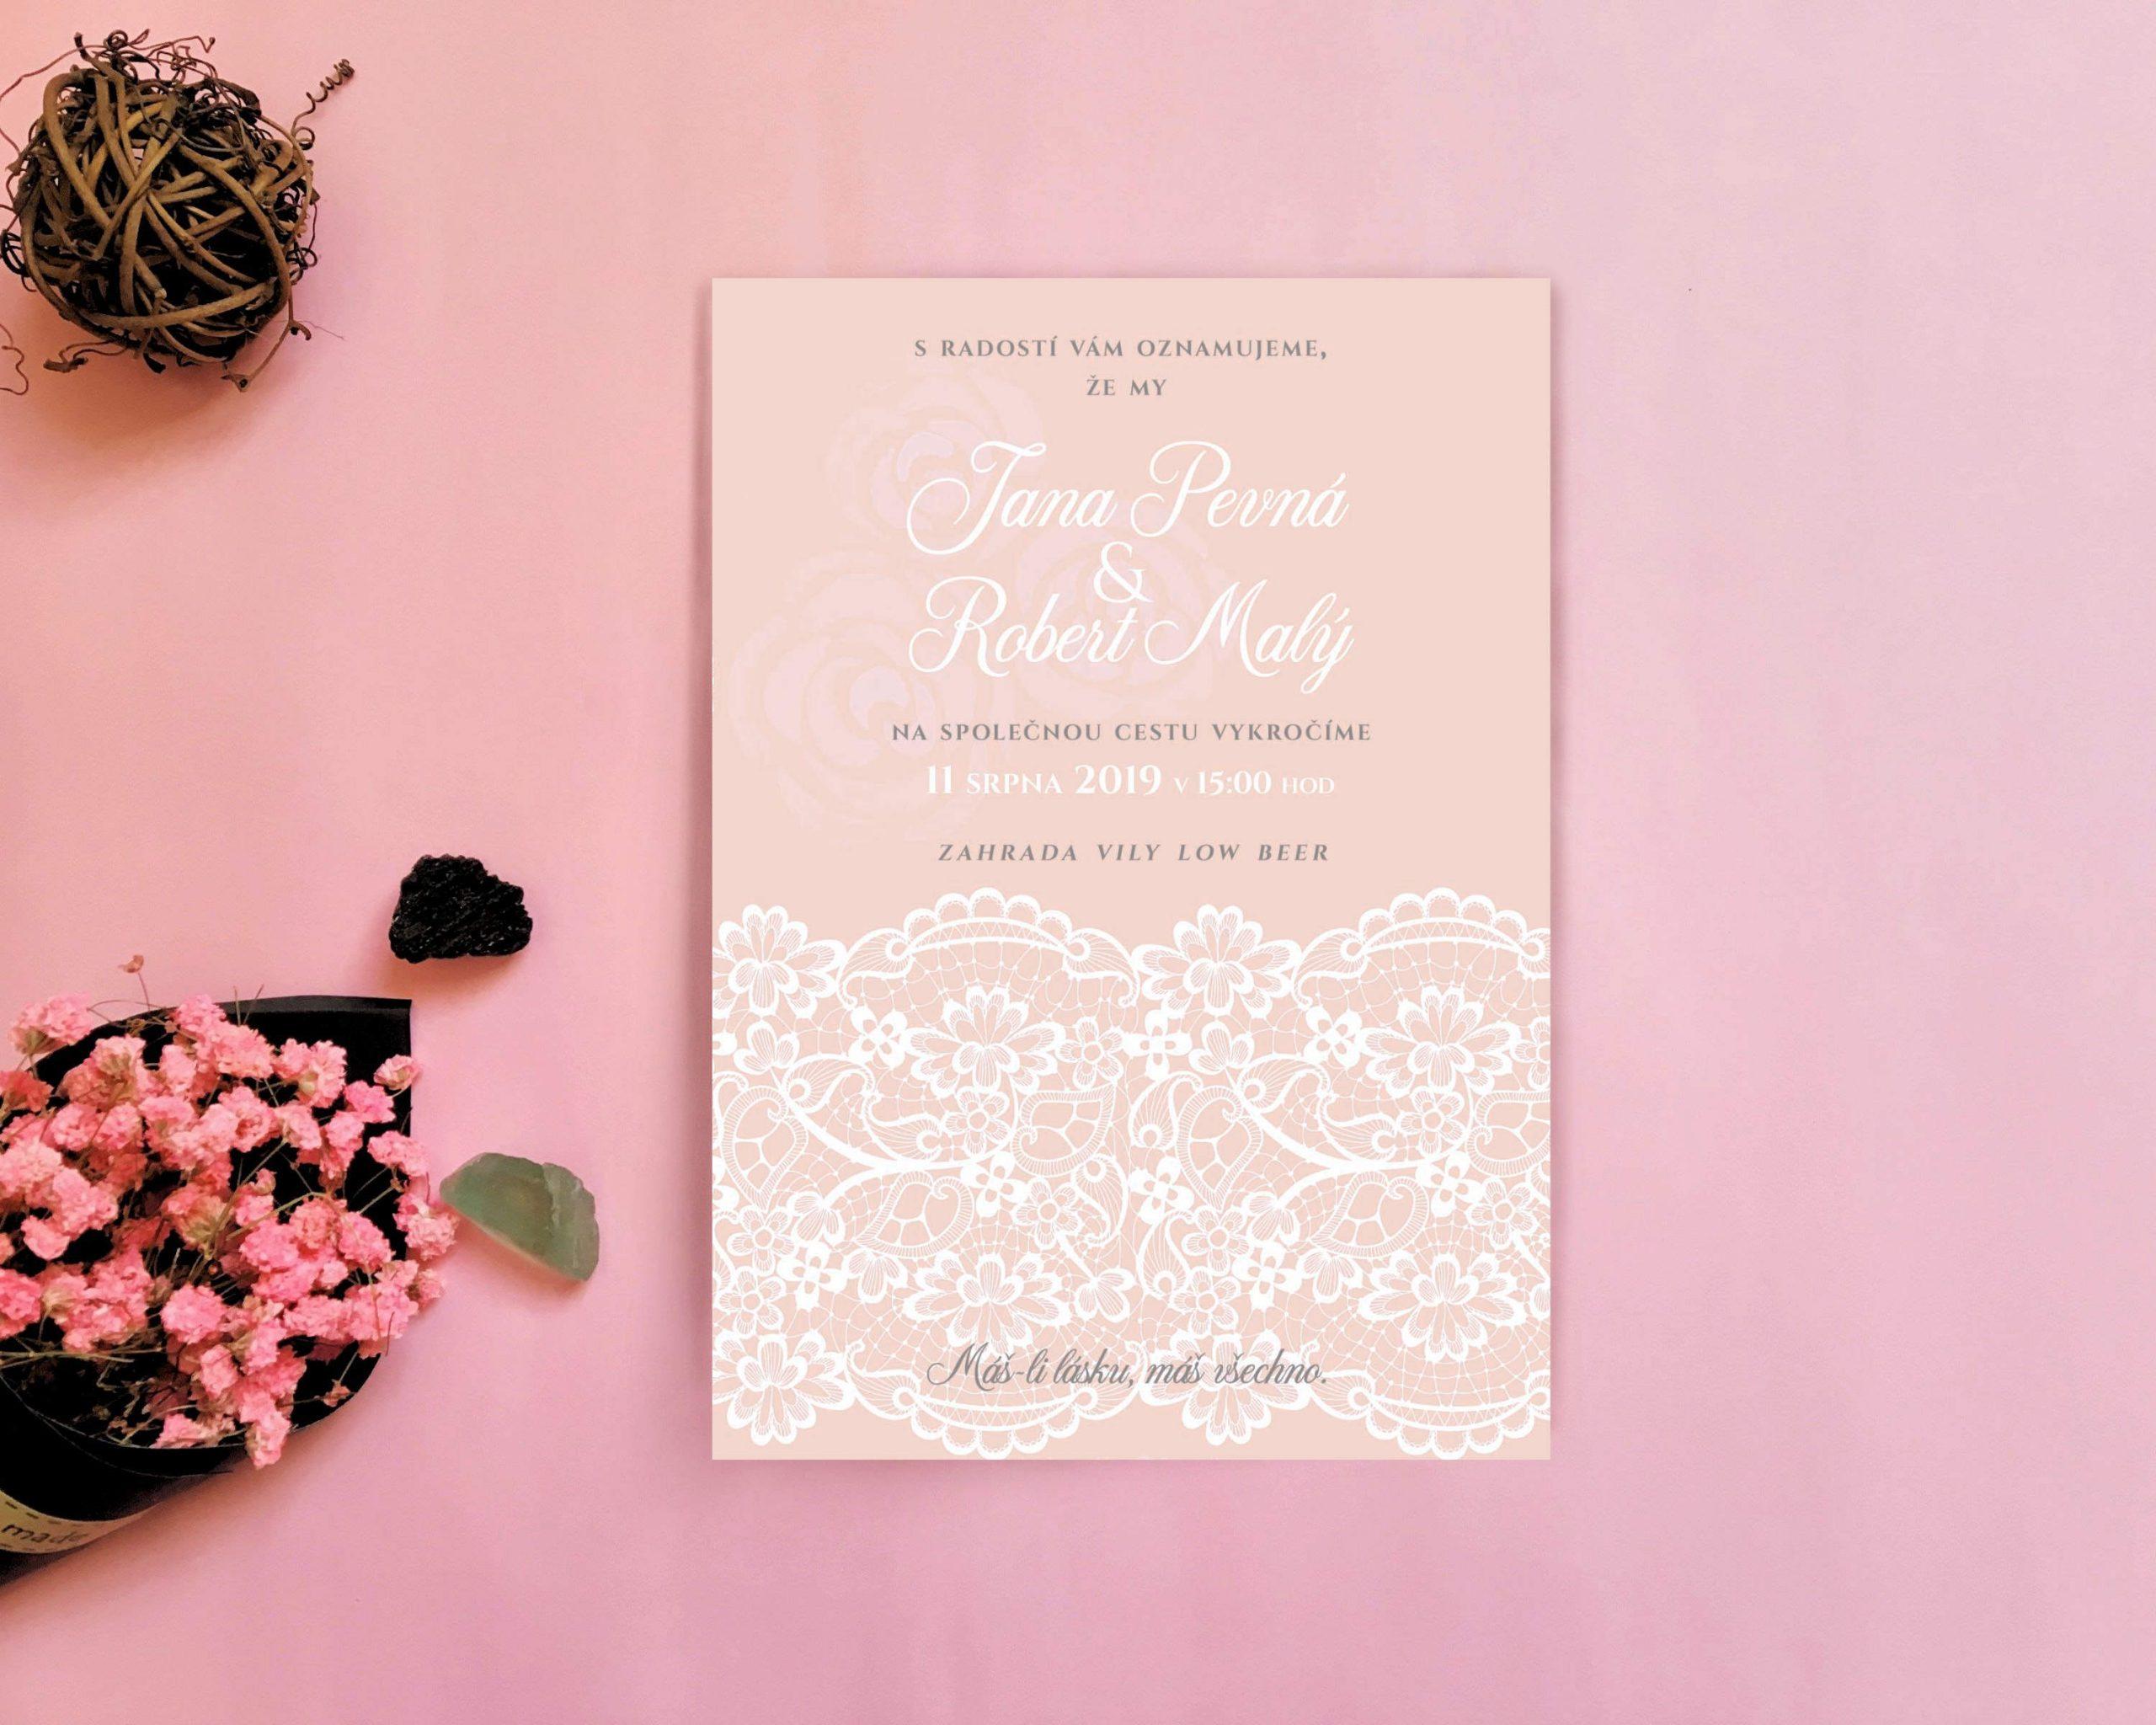 svatebni oznameni, svatebni pozvanky